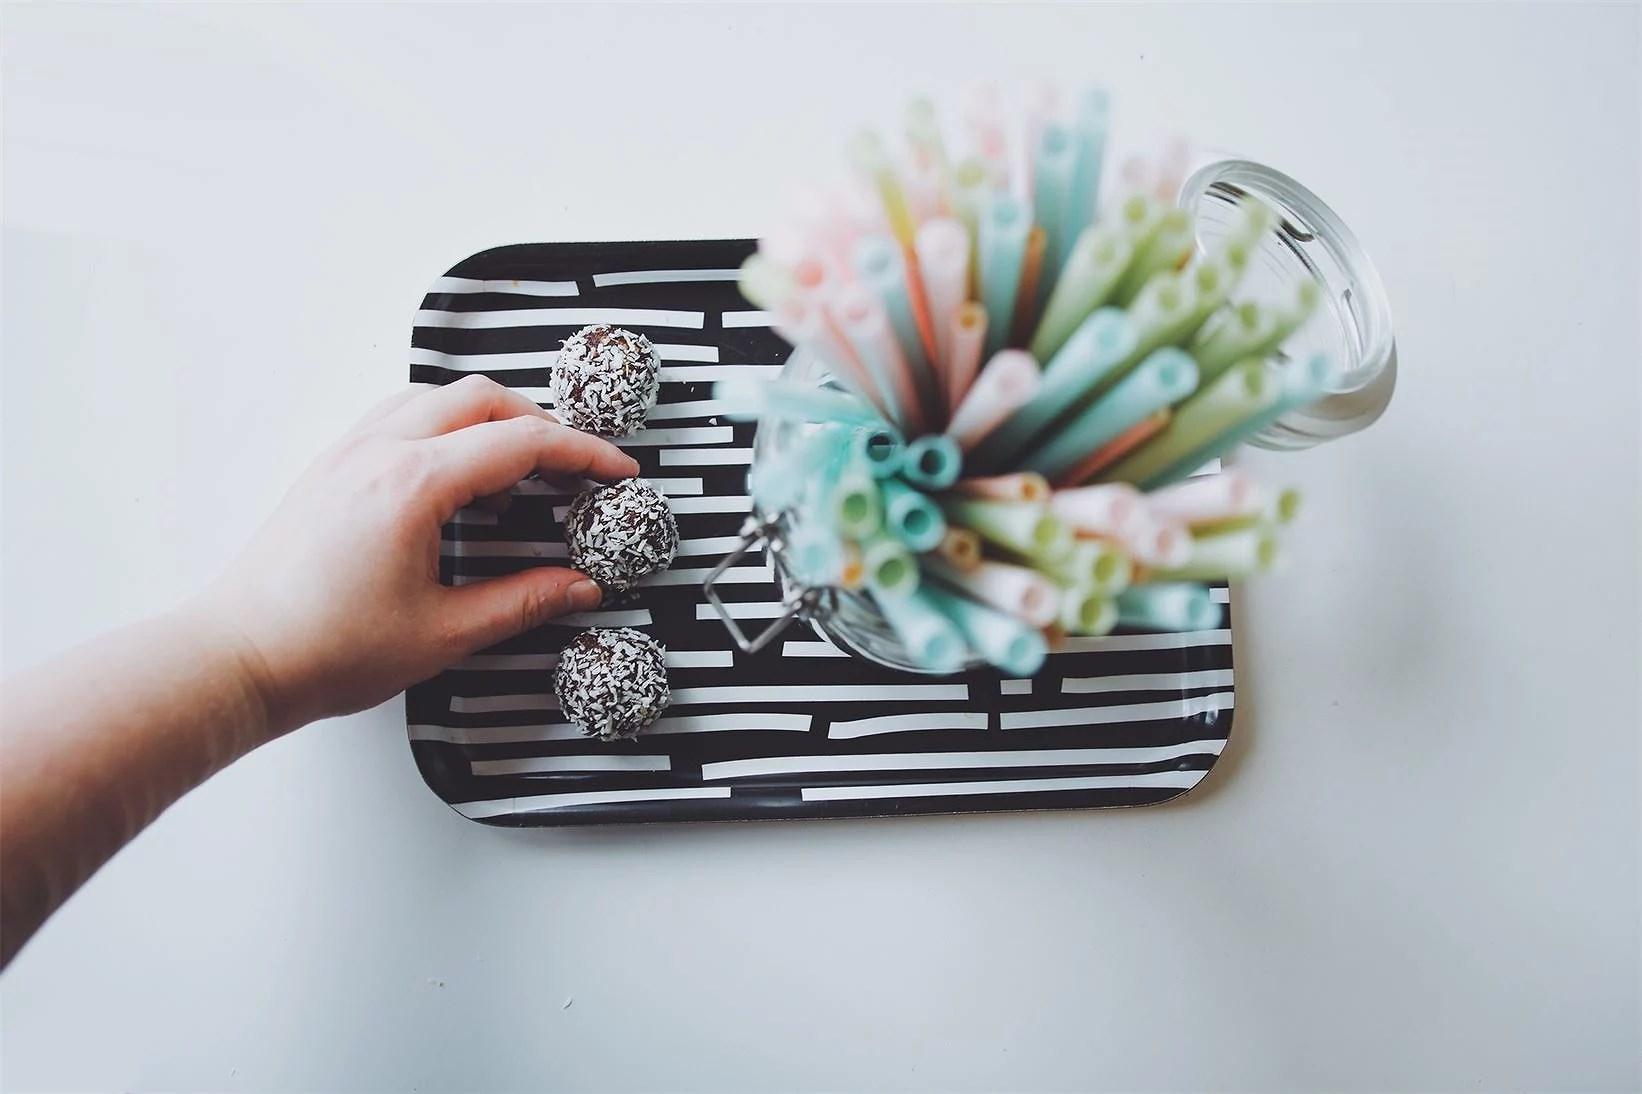 ❥ Nyttigare chokladbollar